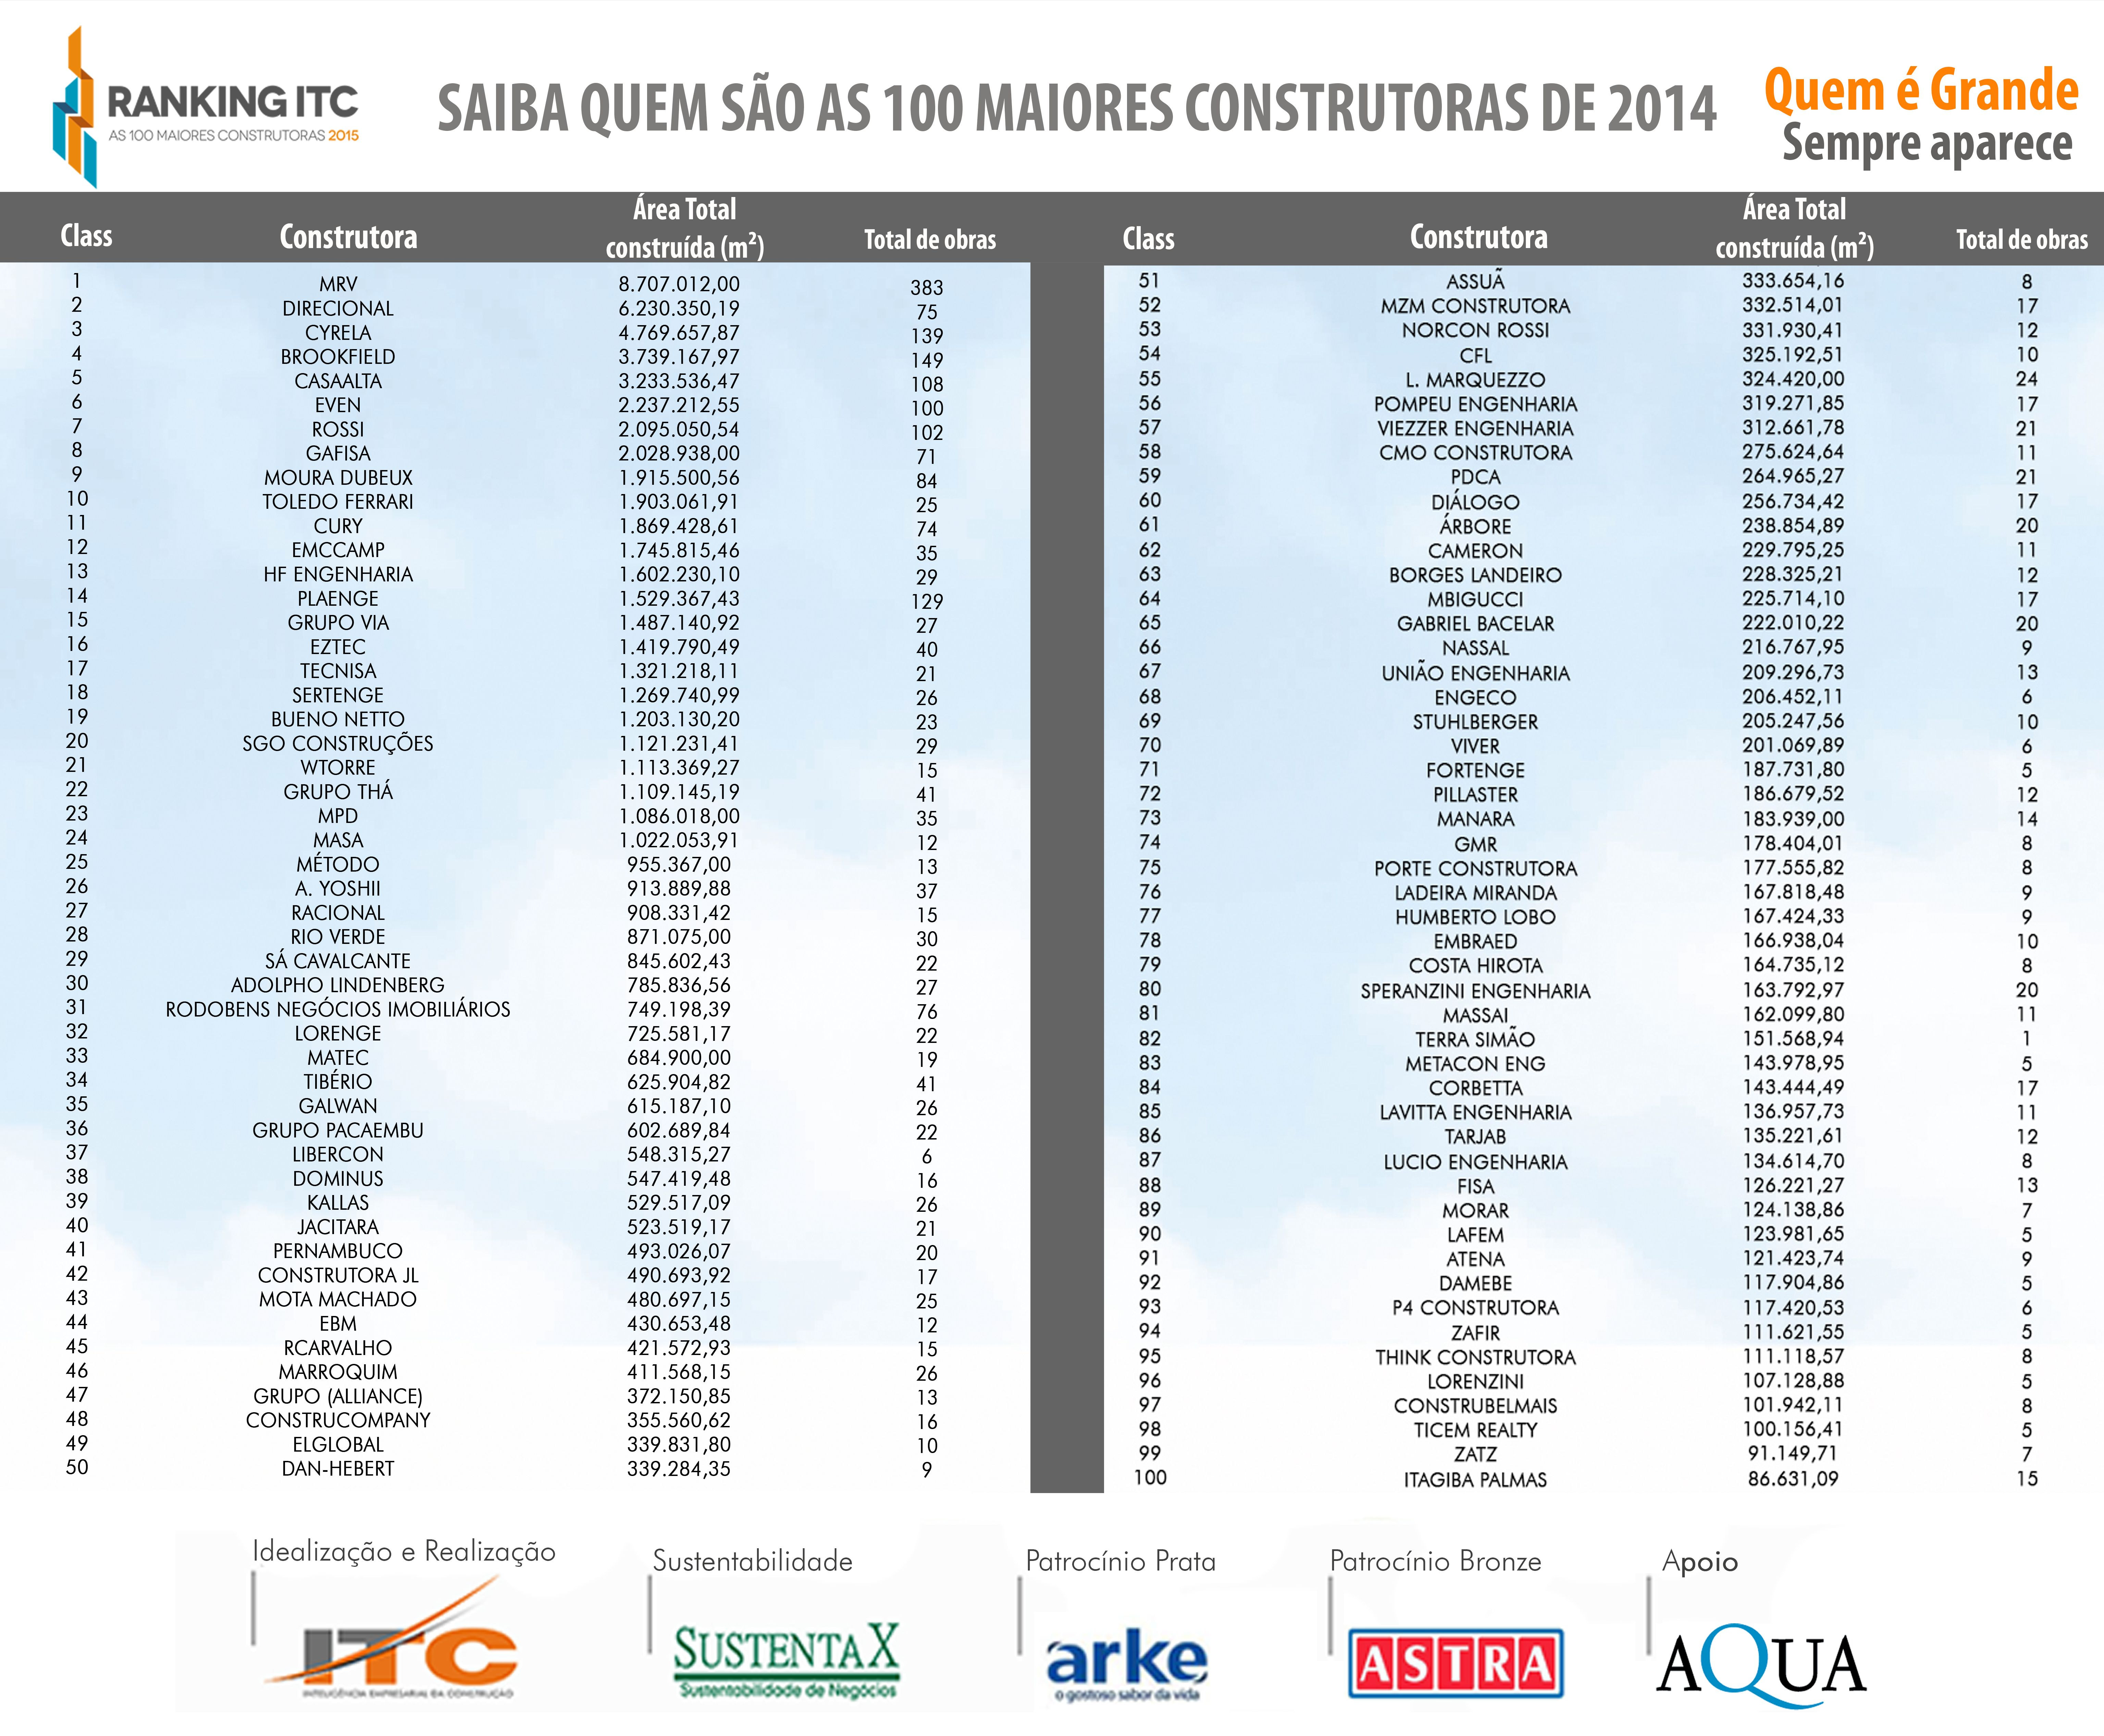 Ranking ITC 2015